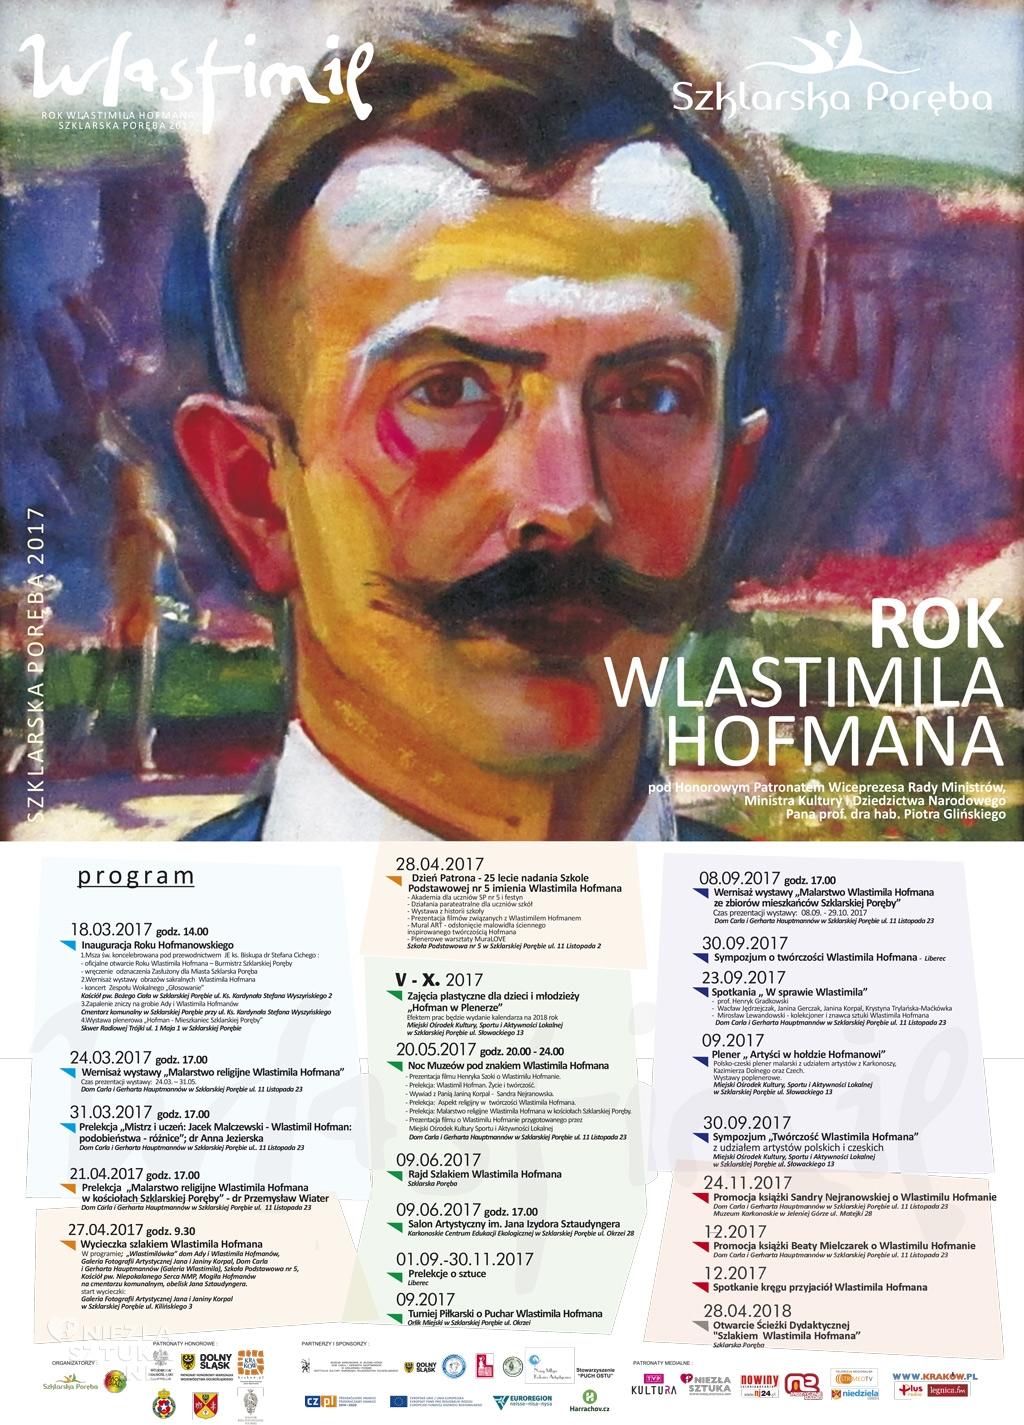 rok_wlastimila_hofmana_szklarska_poreba